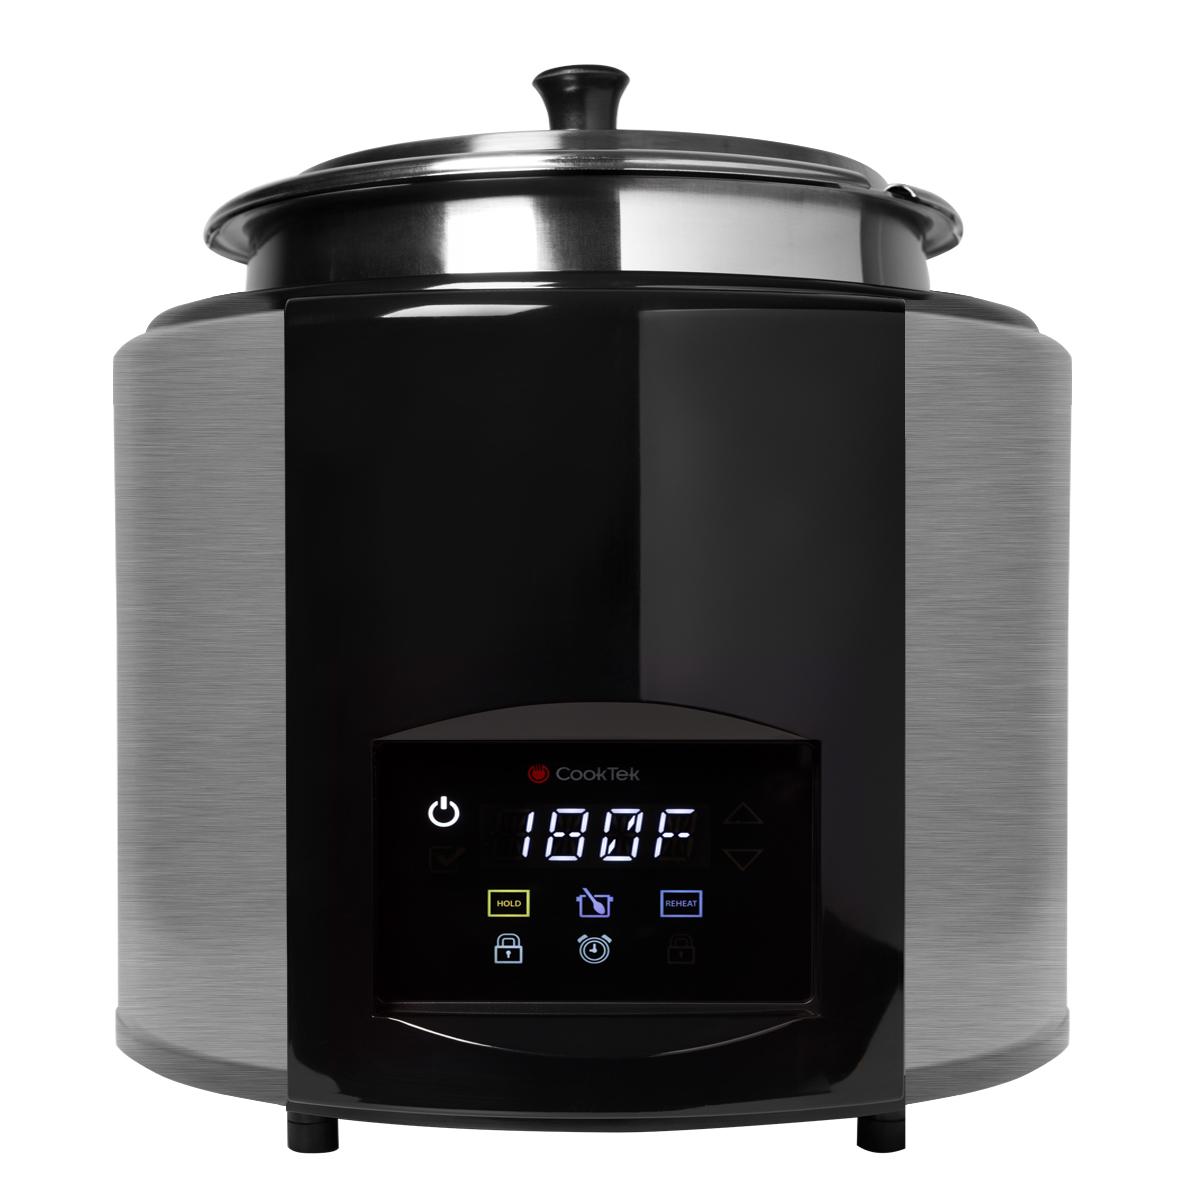 CookTek 676101 soup kettle